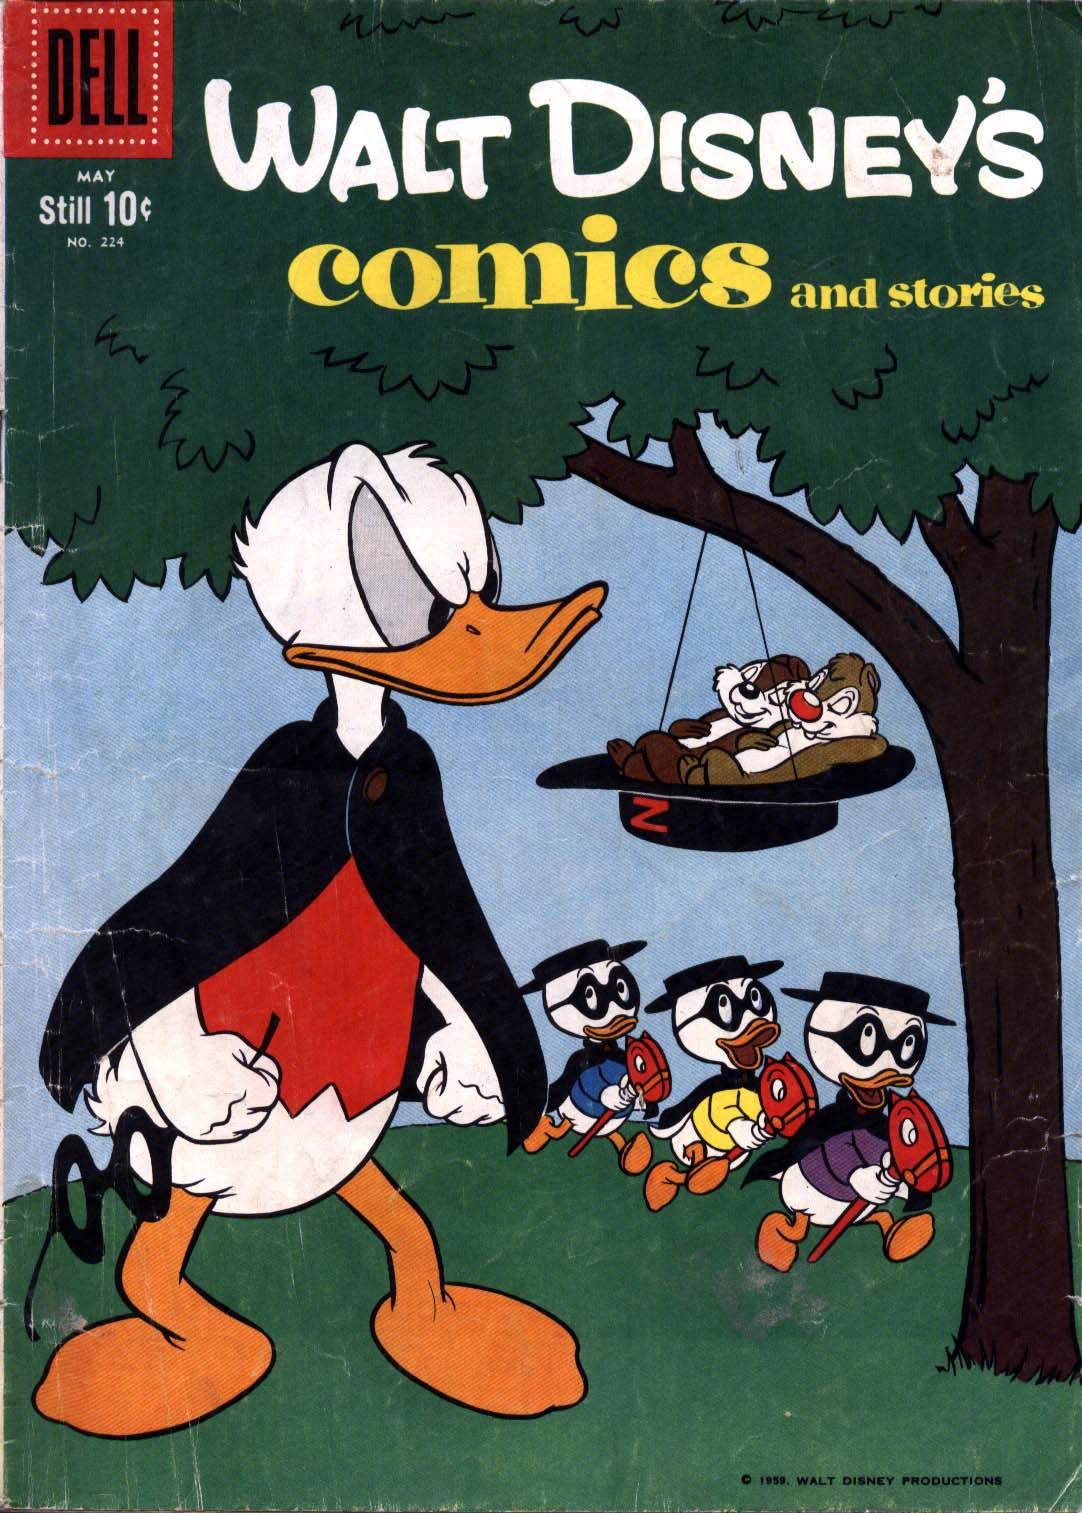 Walt Disneys Comics and Stories 224 Page 1